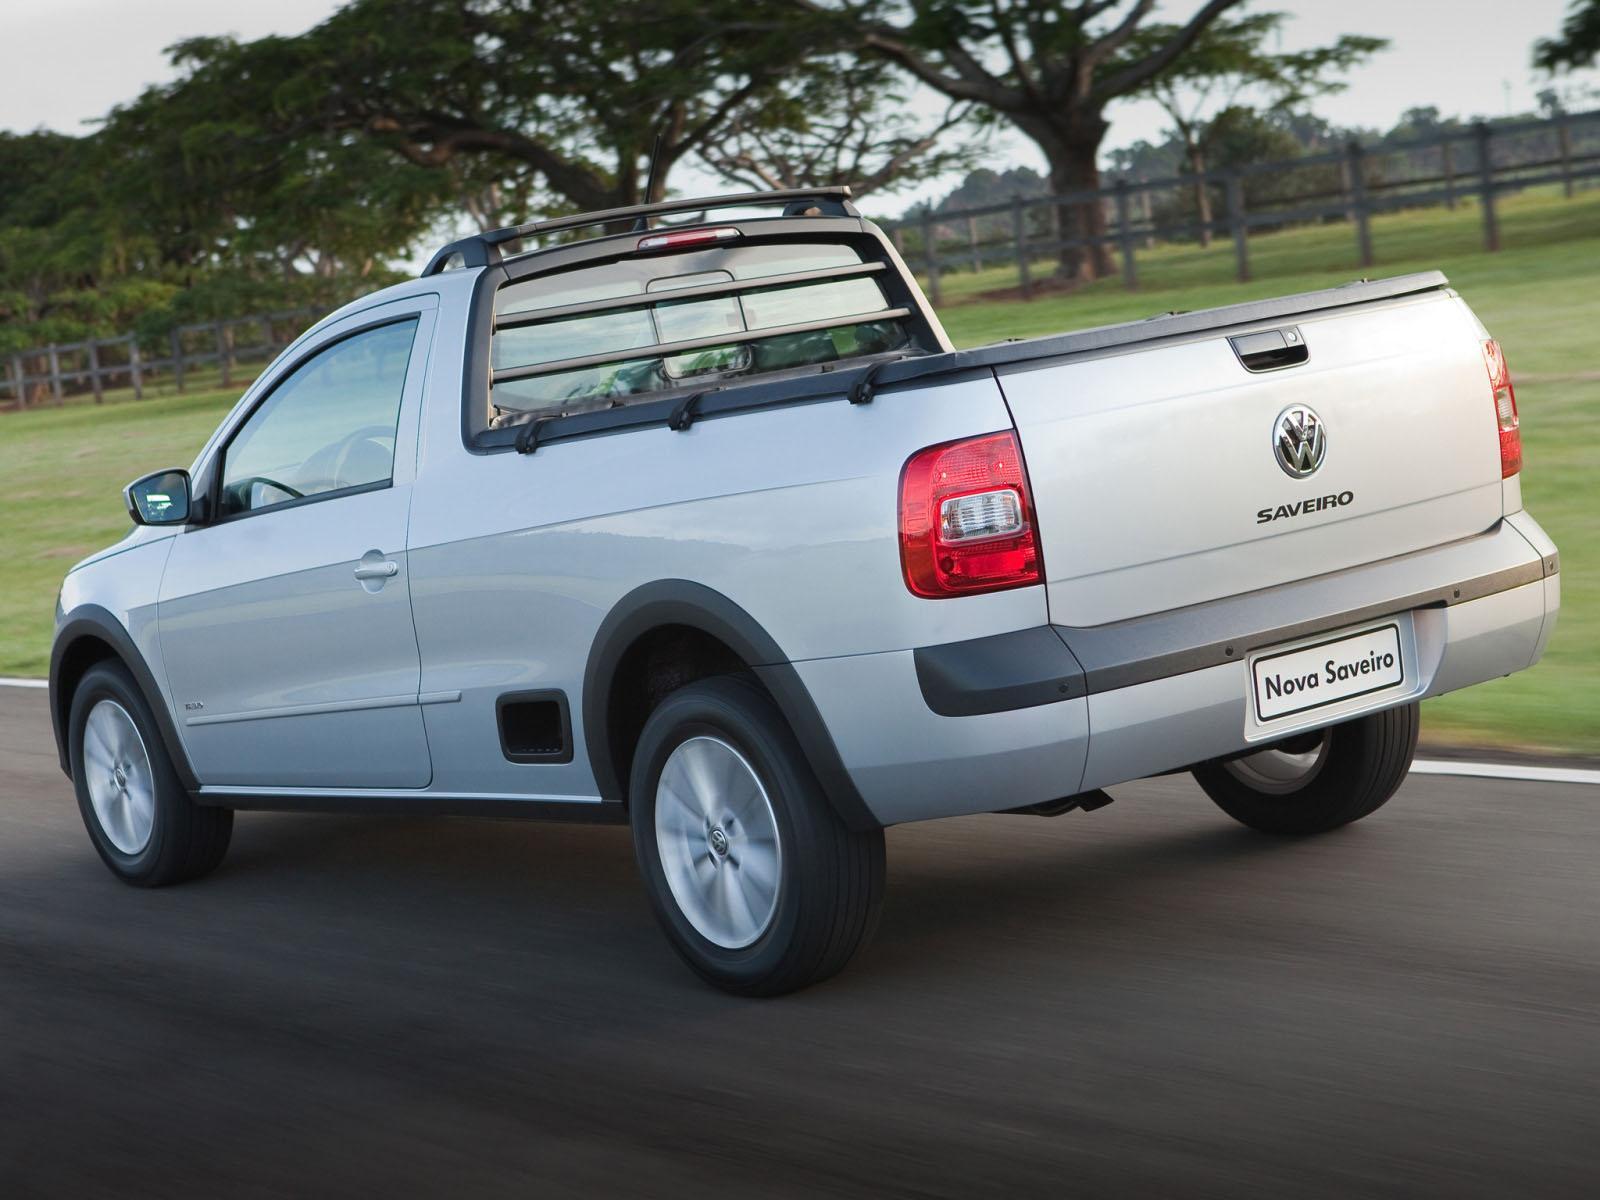 Volkswagen Saveiro 2013 - Autocosmos.com